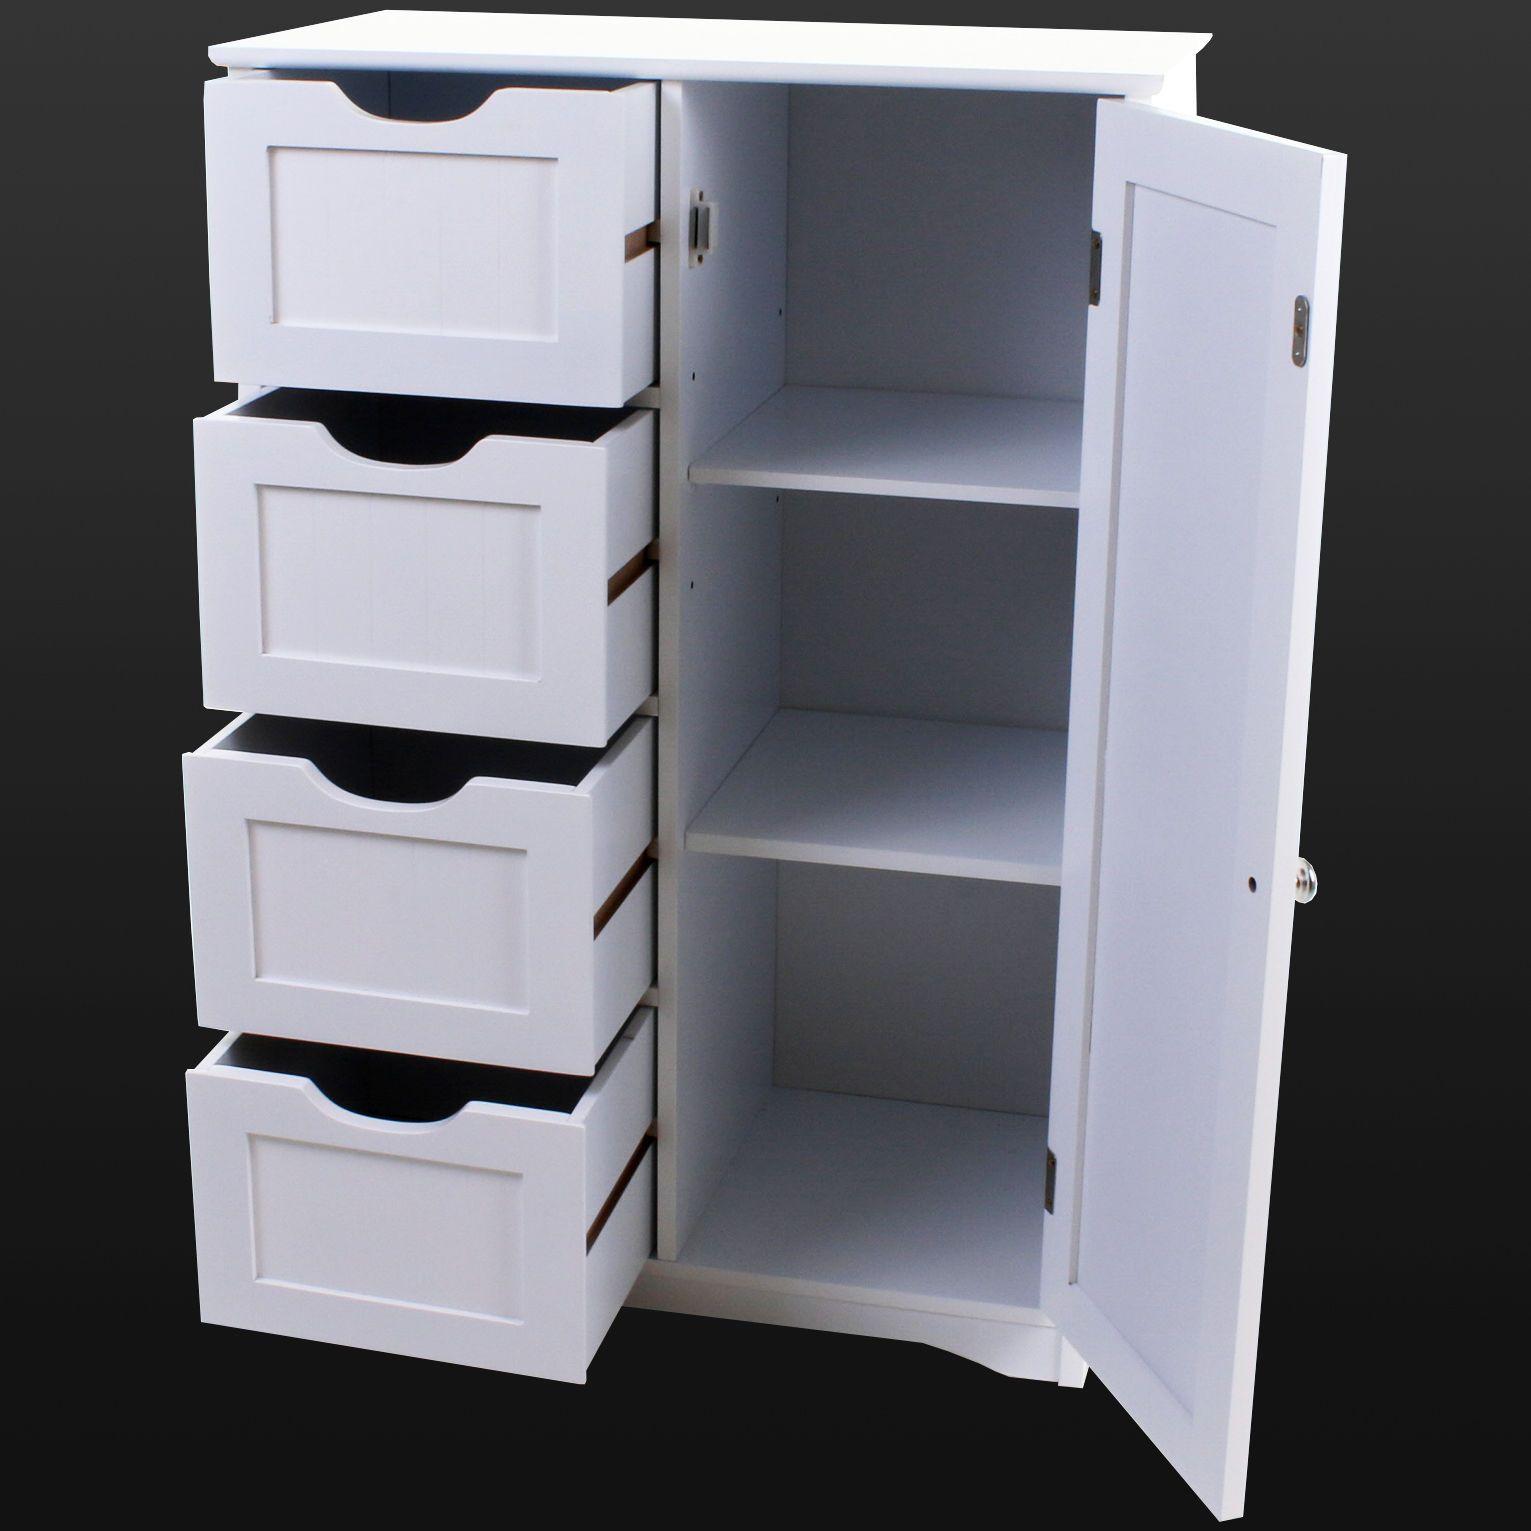 4 Drawer Bathroom Cabinet Storage Unit Wooden Chest Cupboard White Door Draw NEW https://t.co/o49EhU73Vj https://t.co/w9xGjmgEqR